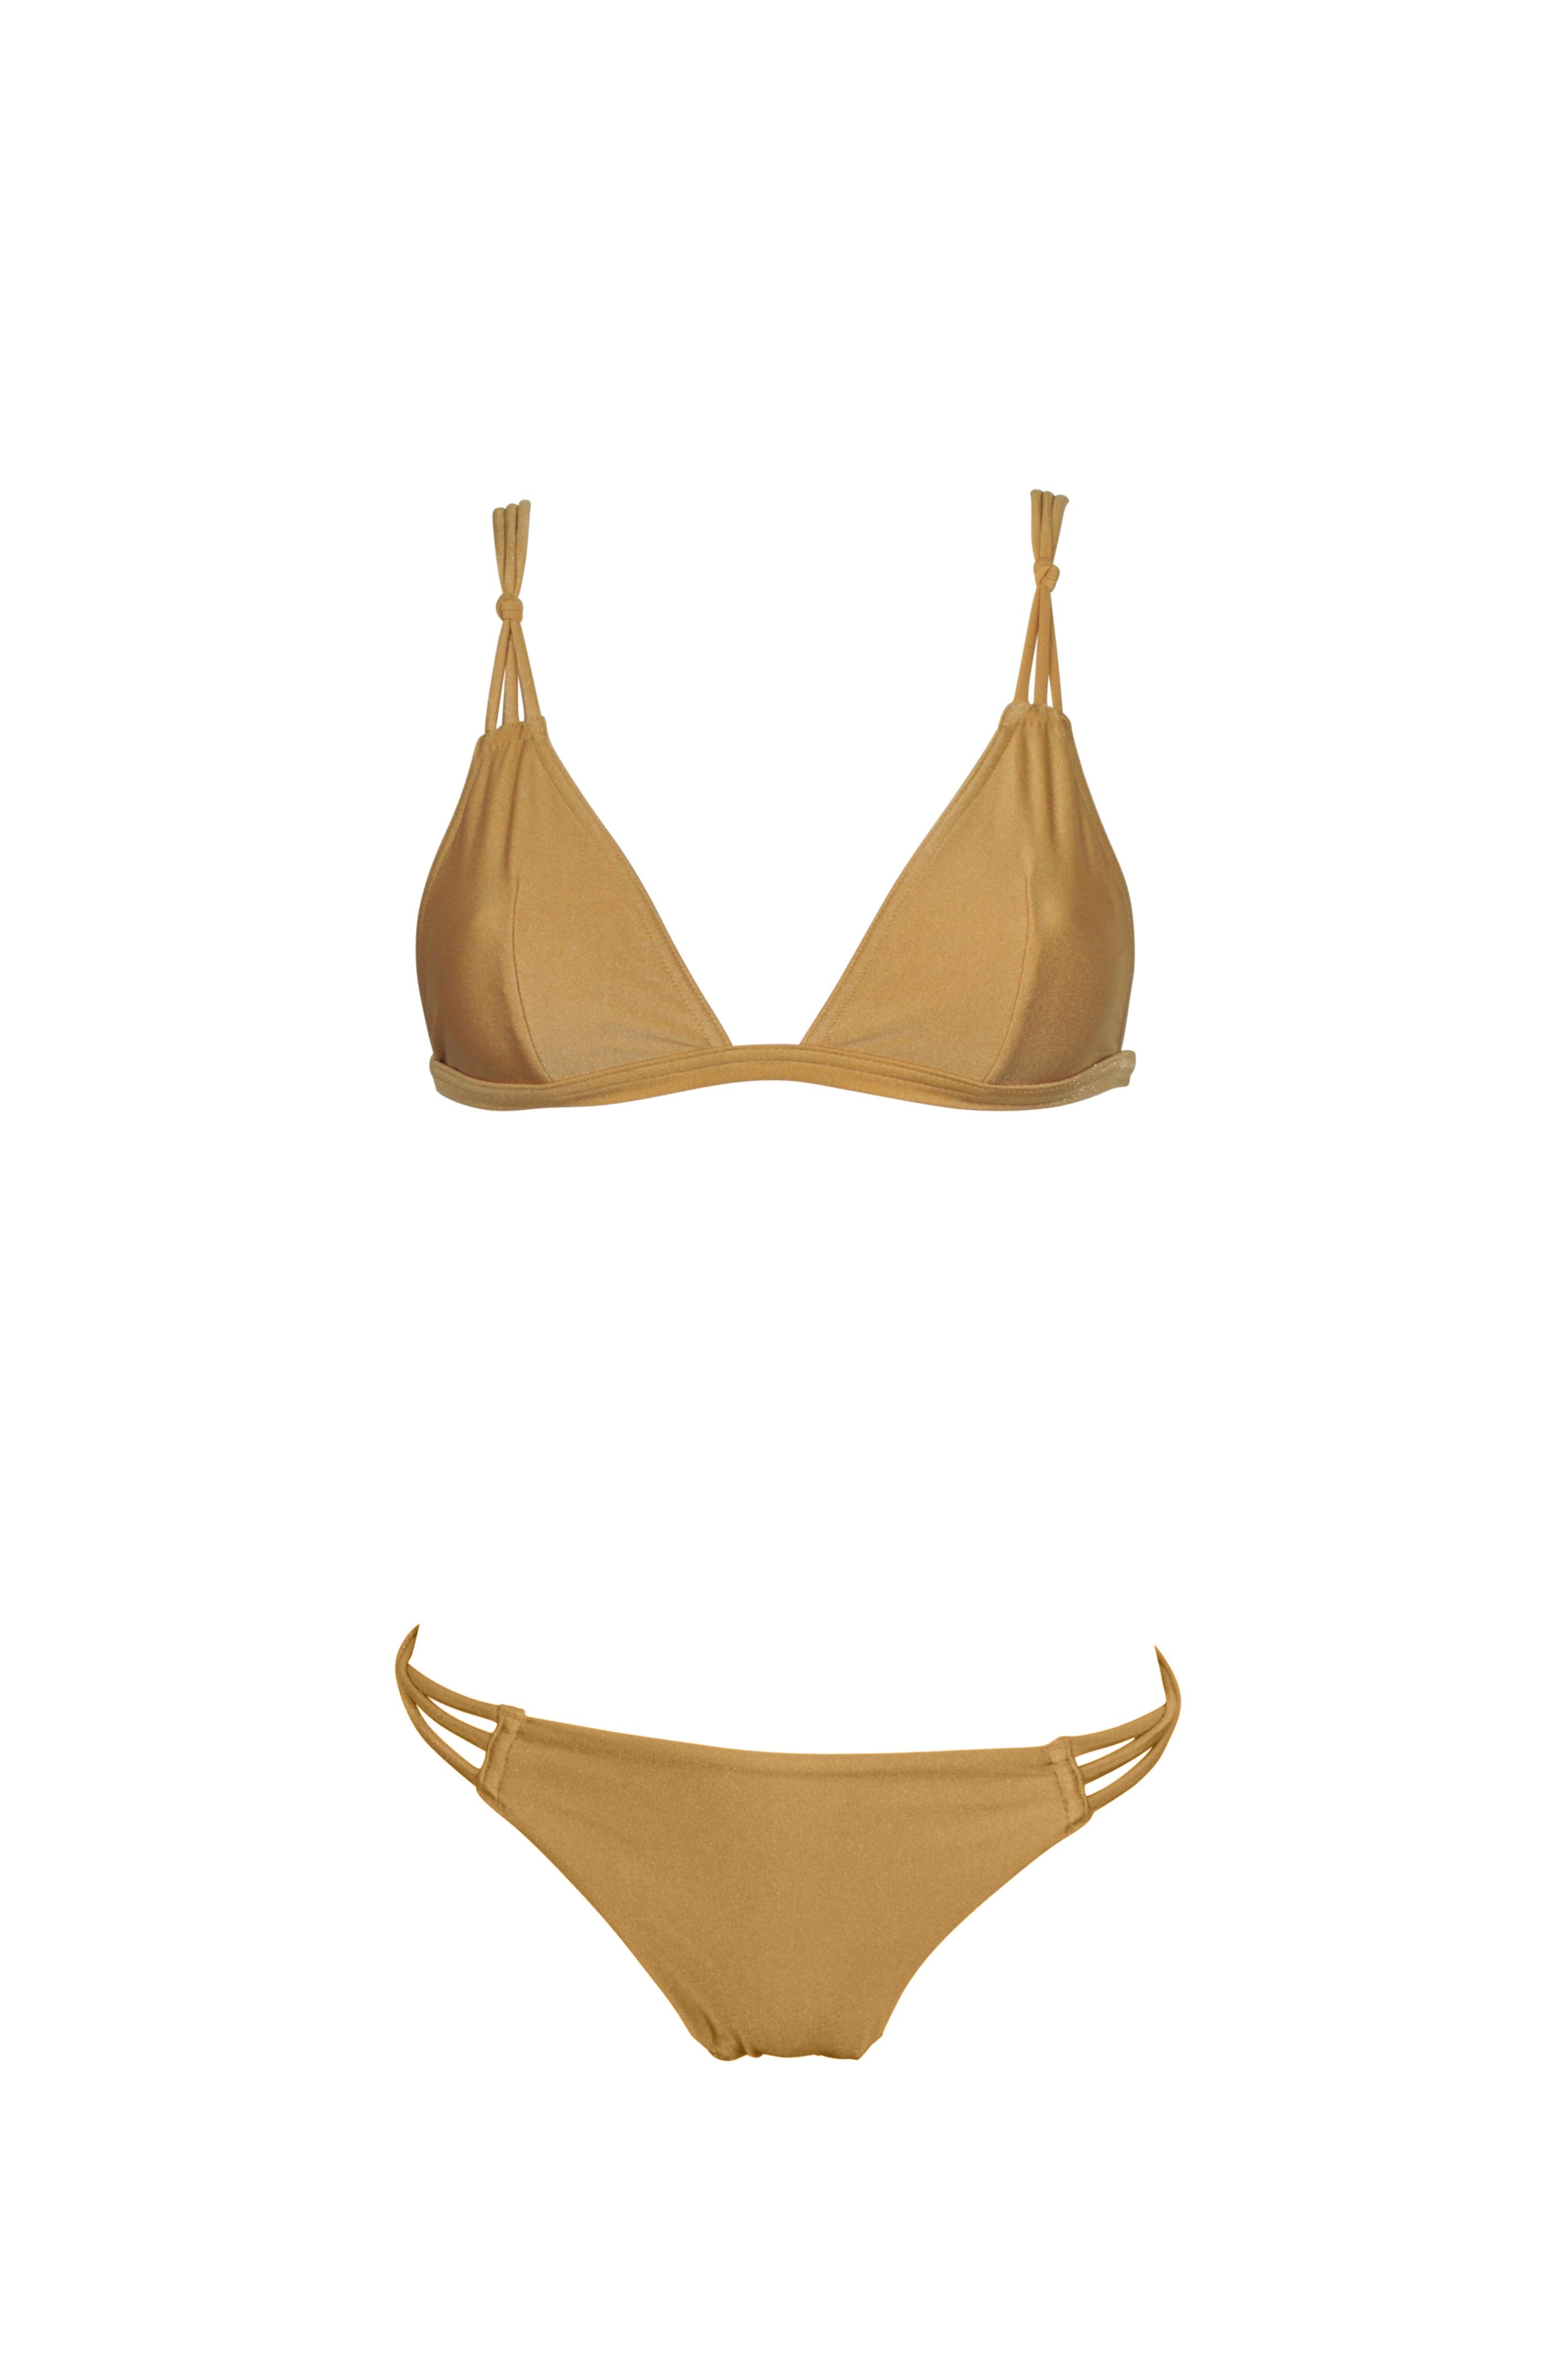 monpetitbikinixnoholita_thème GOLD_GOLD-HAUT-30 35e & GOLD-BAS-30 30e